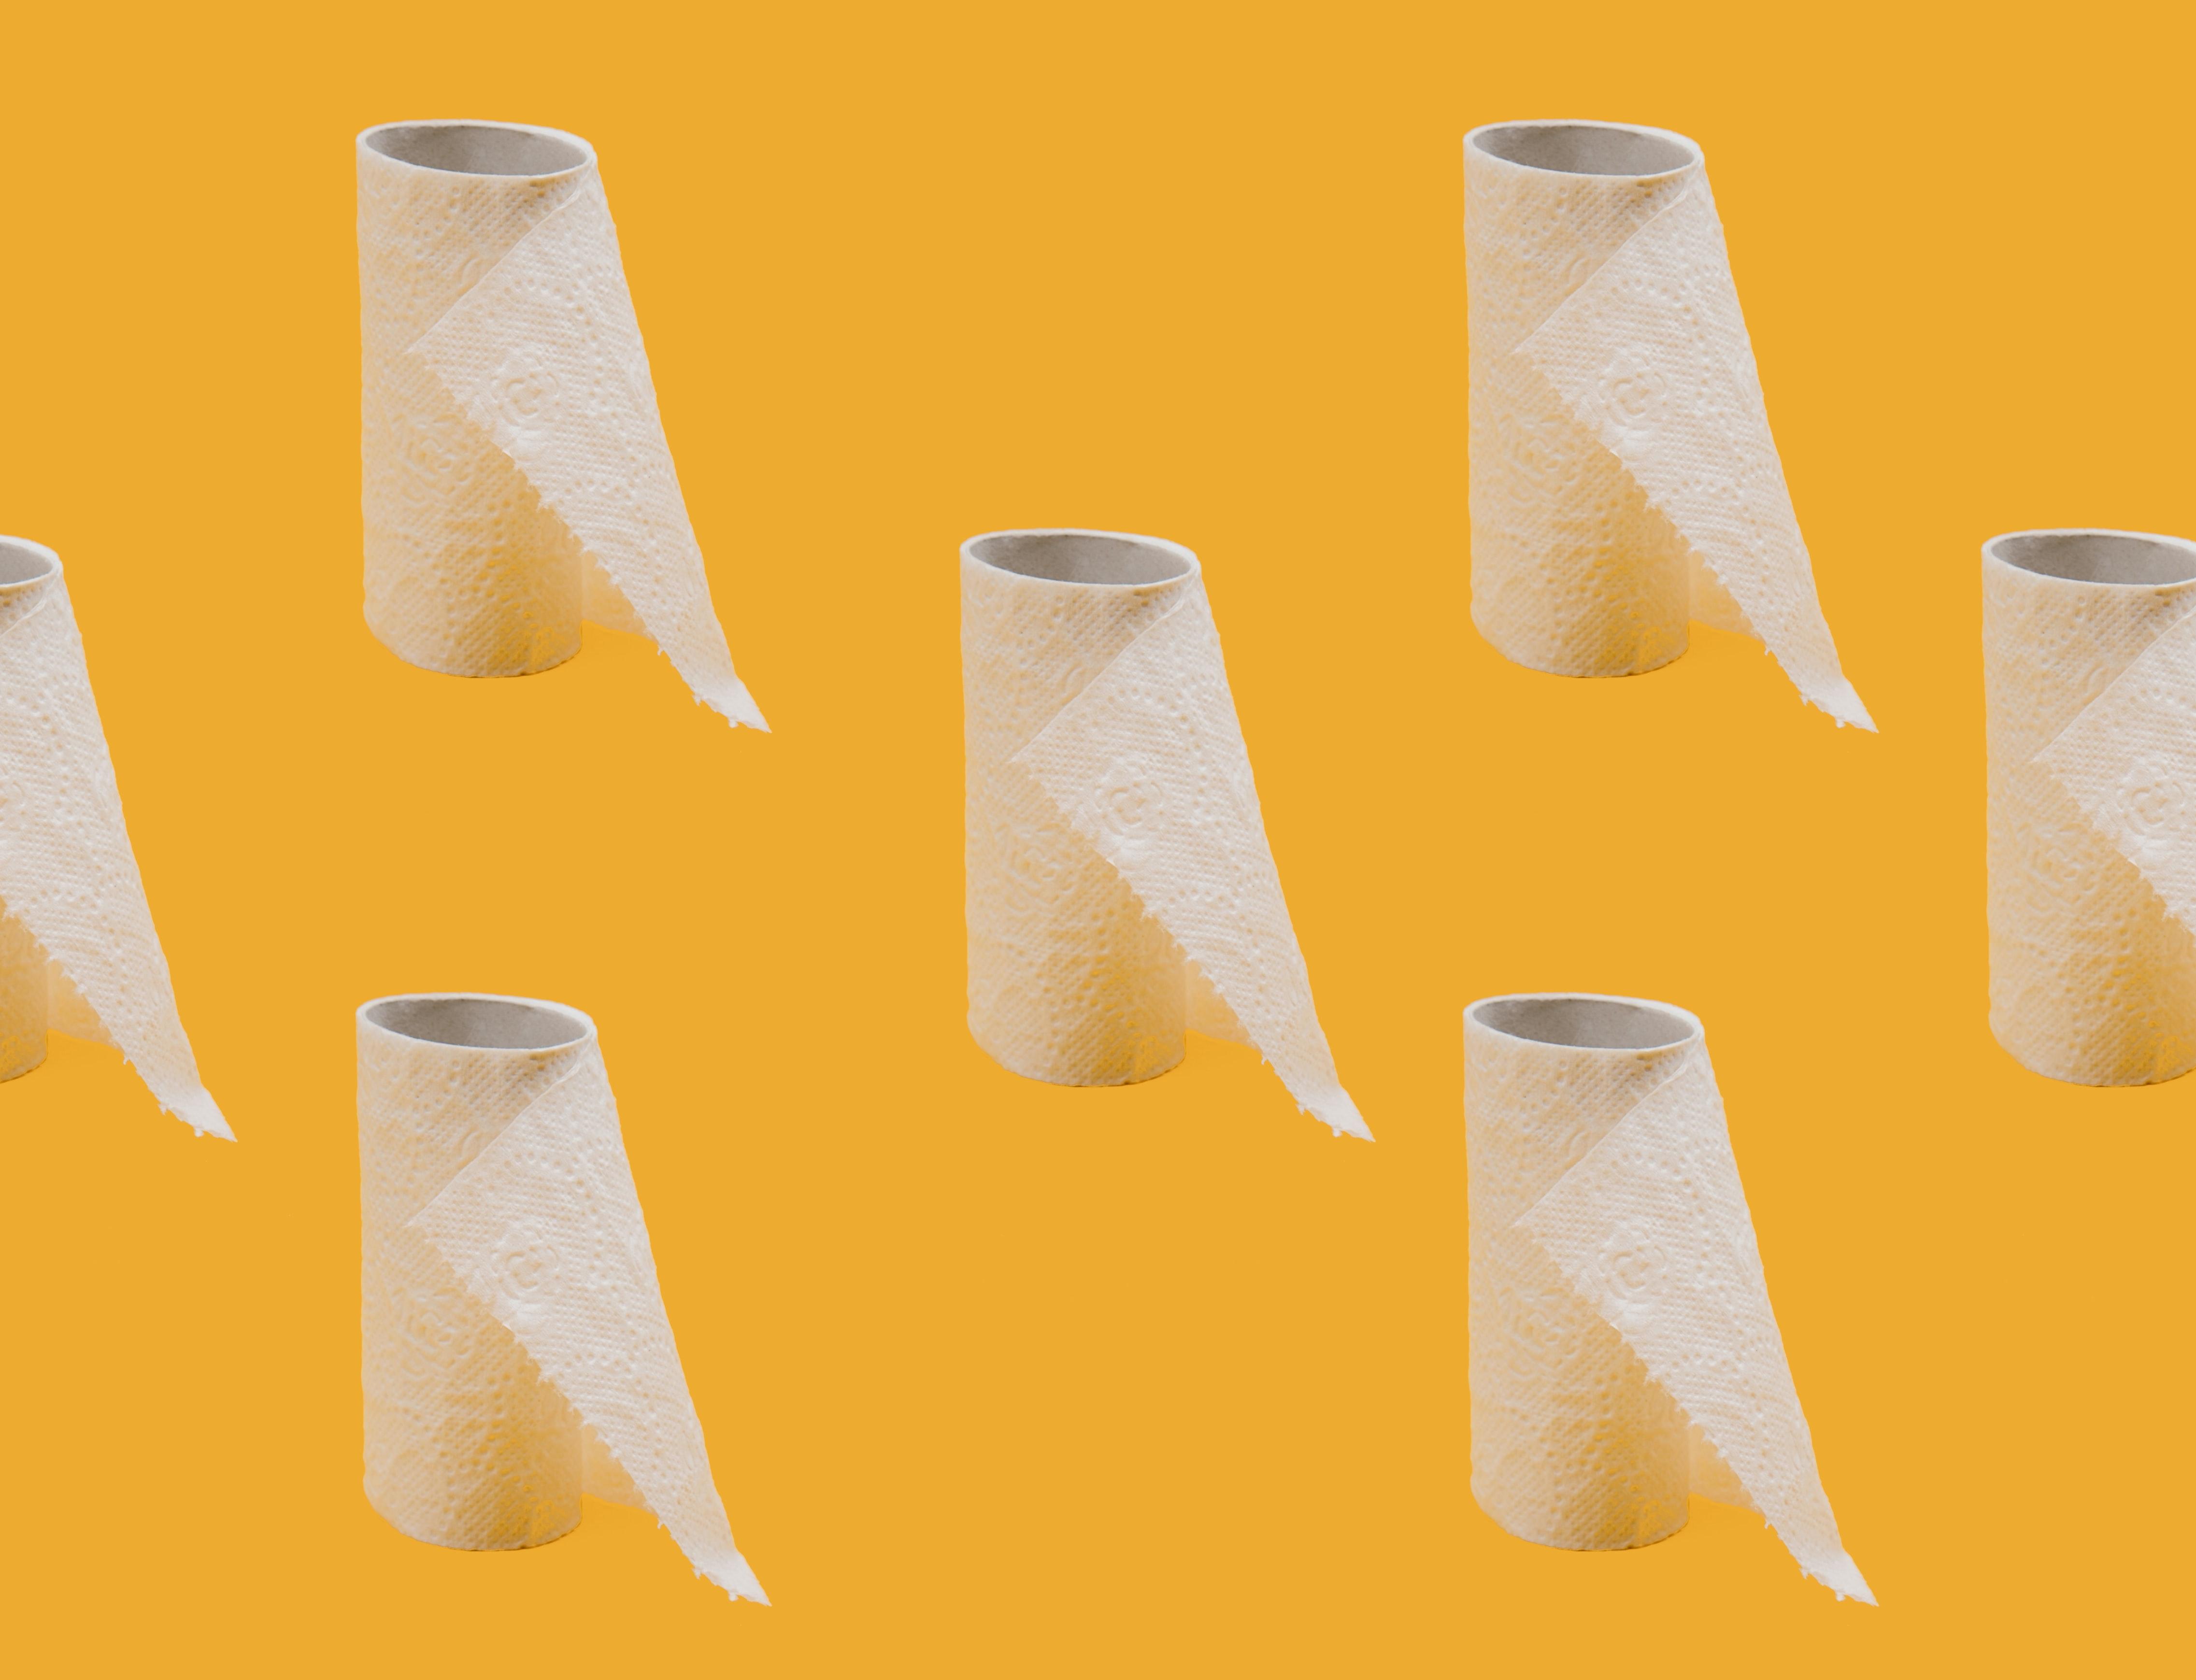 Should I use toilet paper or a bidet?